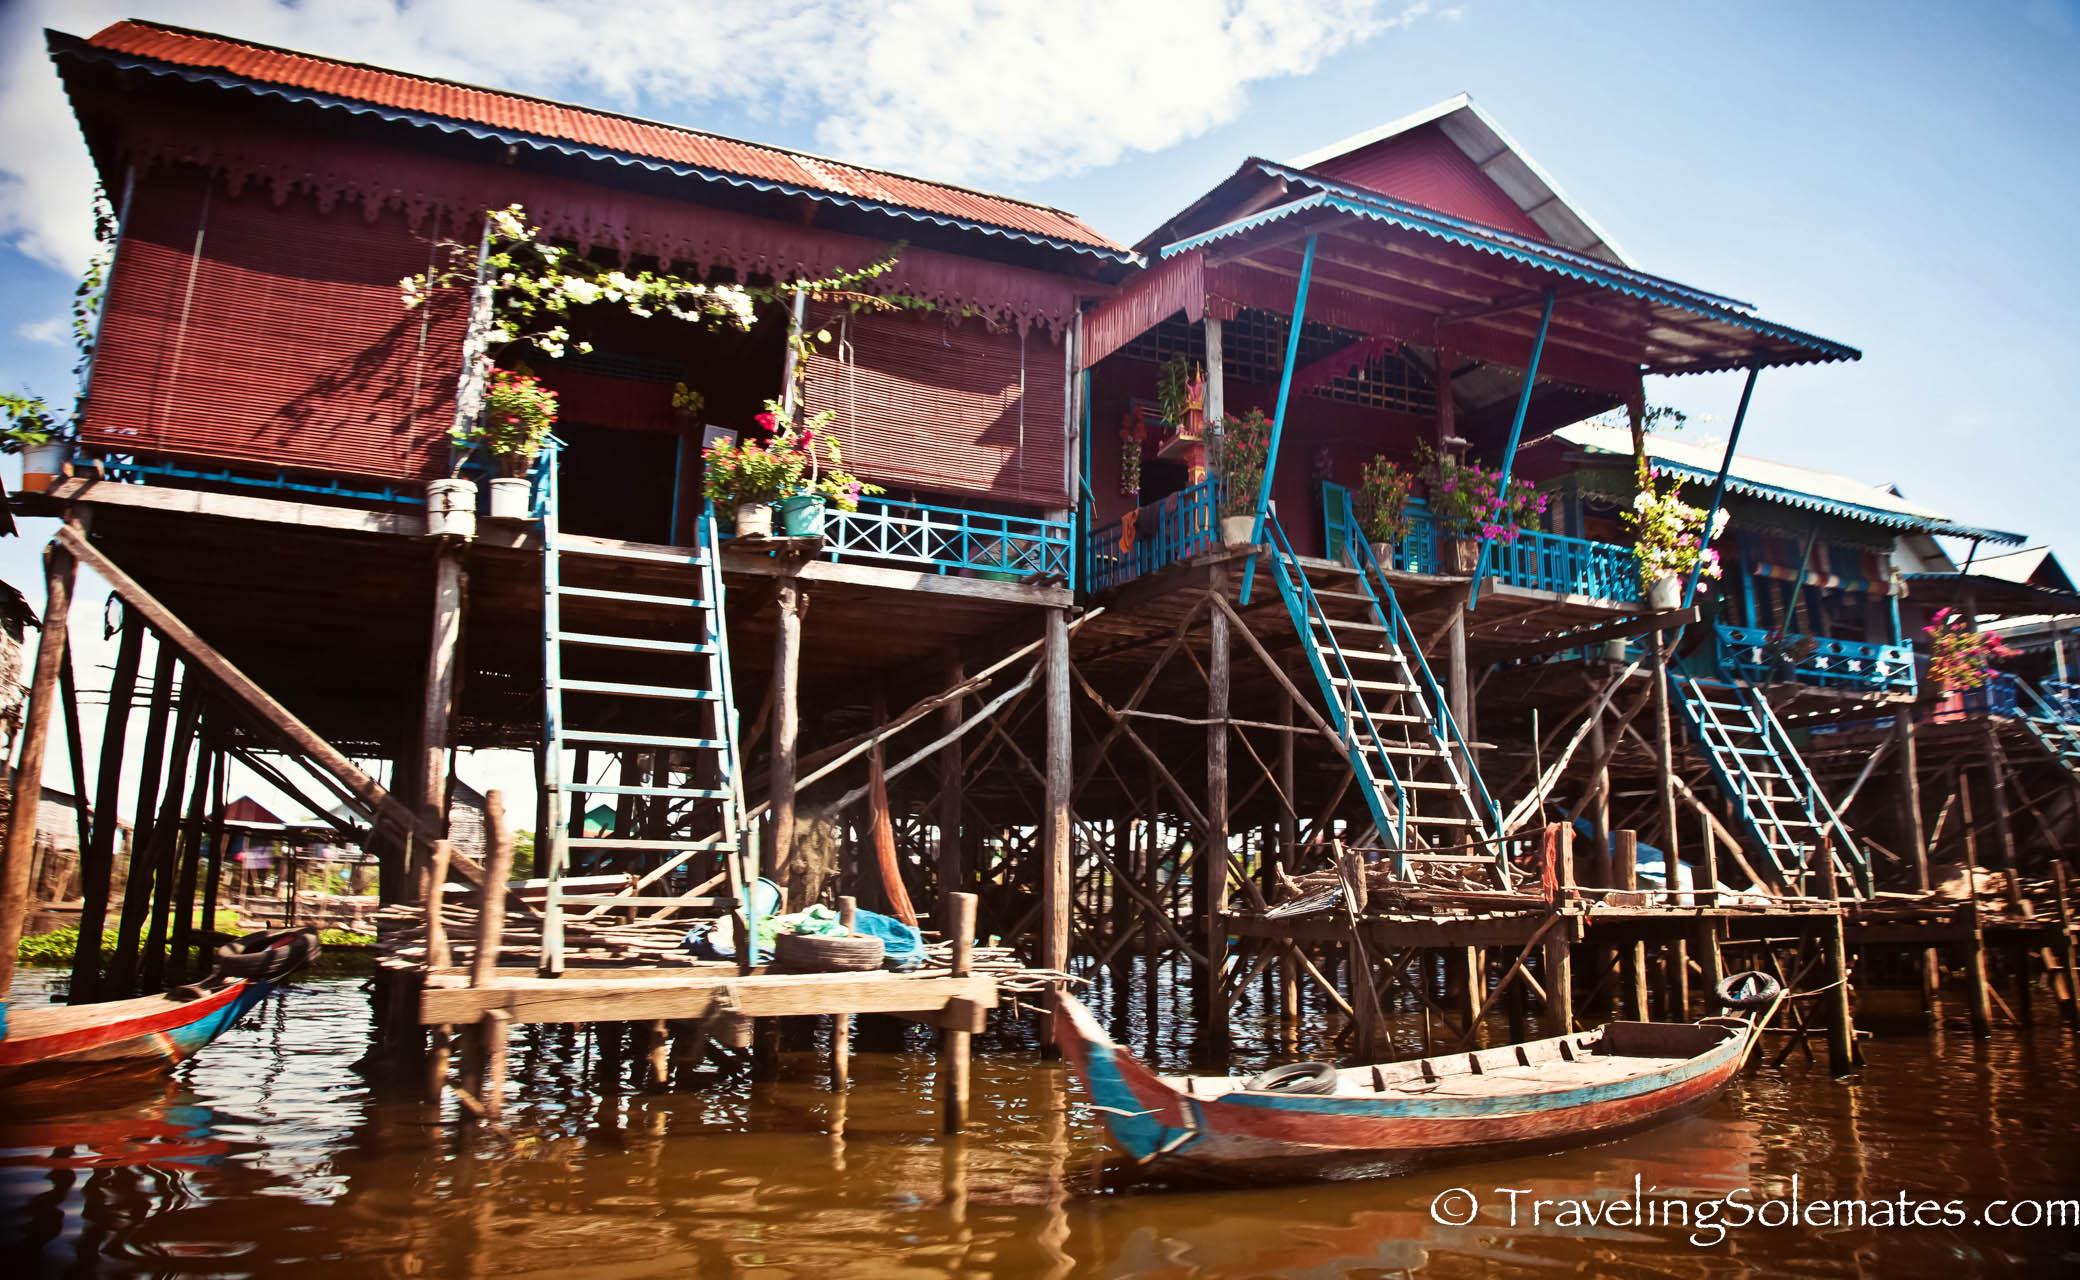 Stilted Houses in Floating Village of Kompong Phluk, Tonle Sap, Cambodia